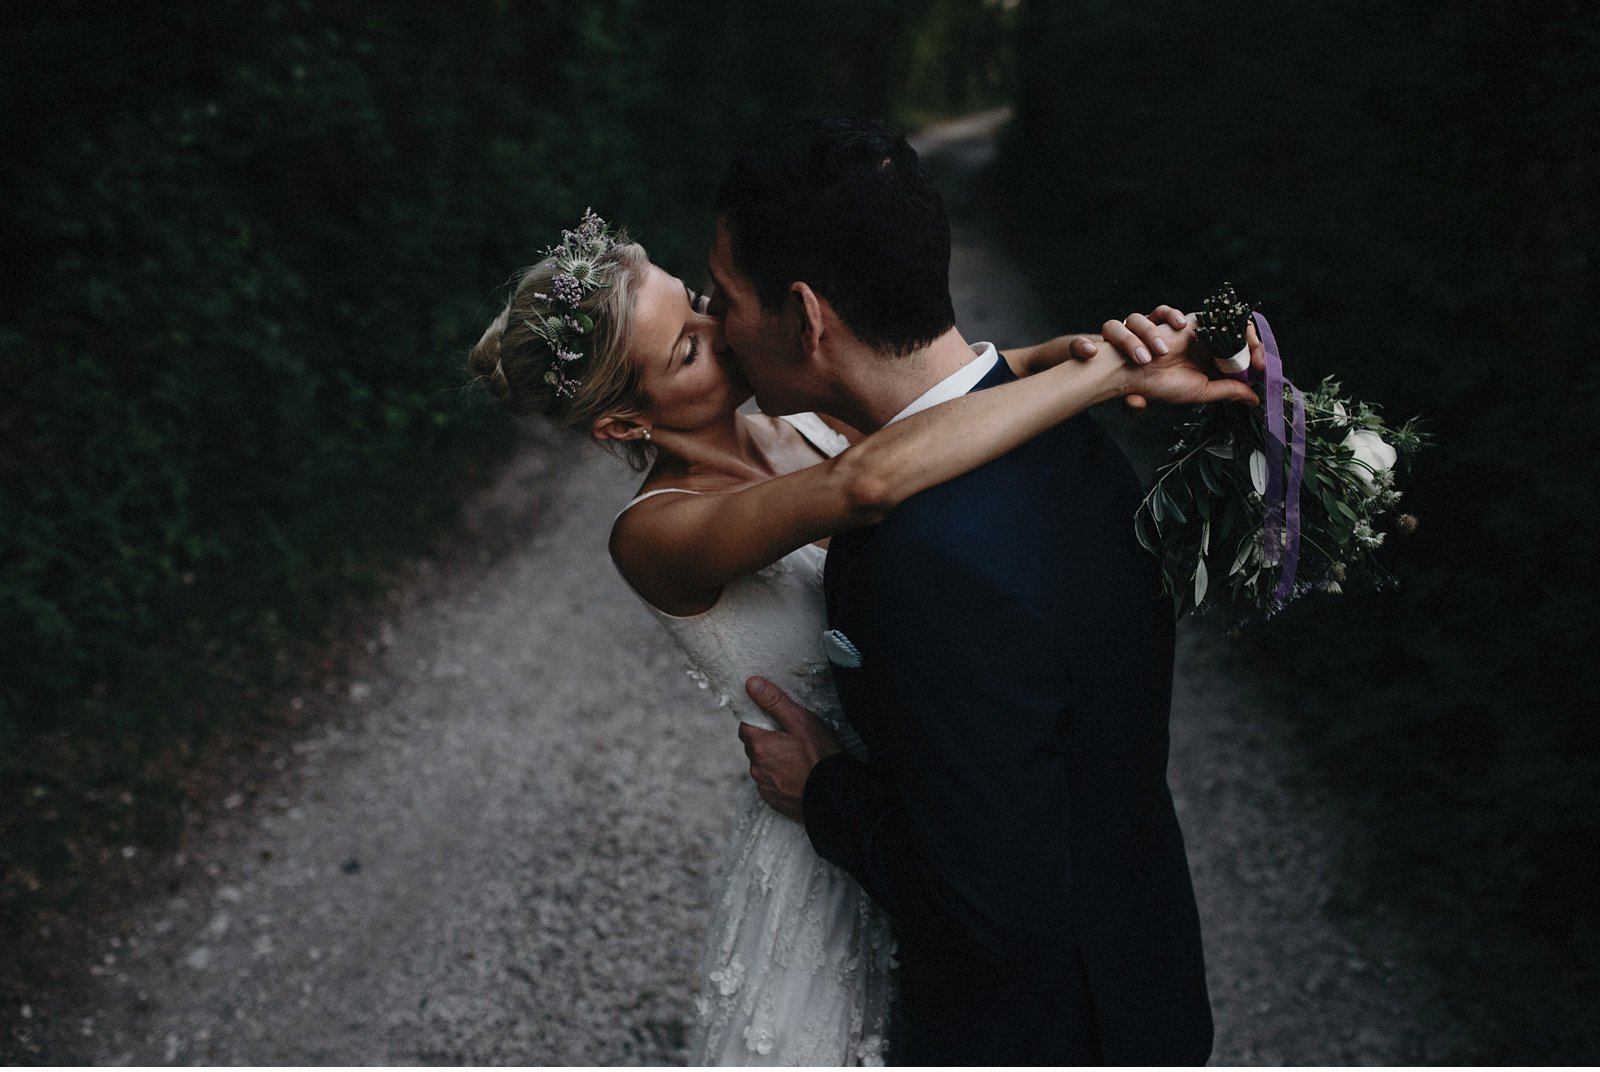 sebastien-boudot-wedding-photographer-south-france_0226